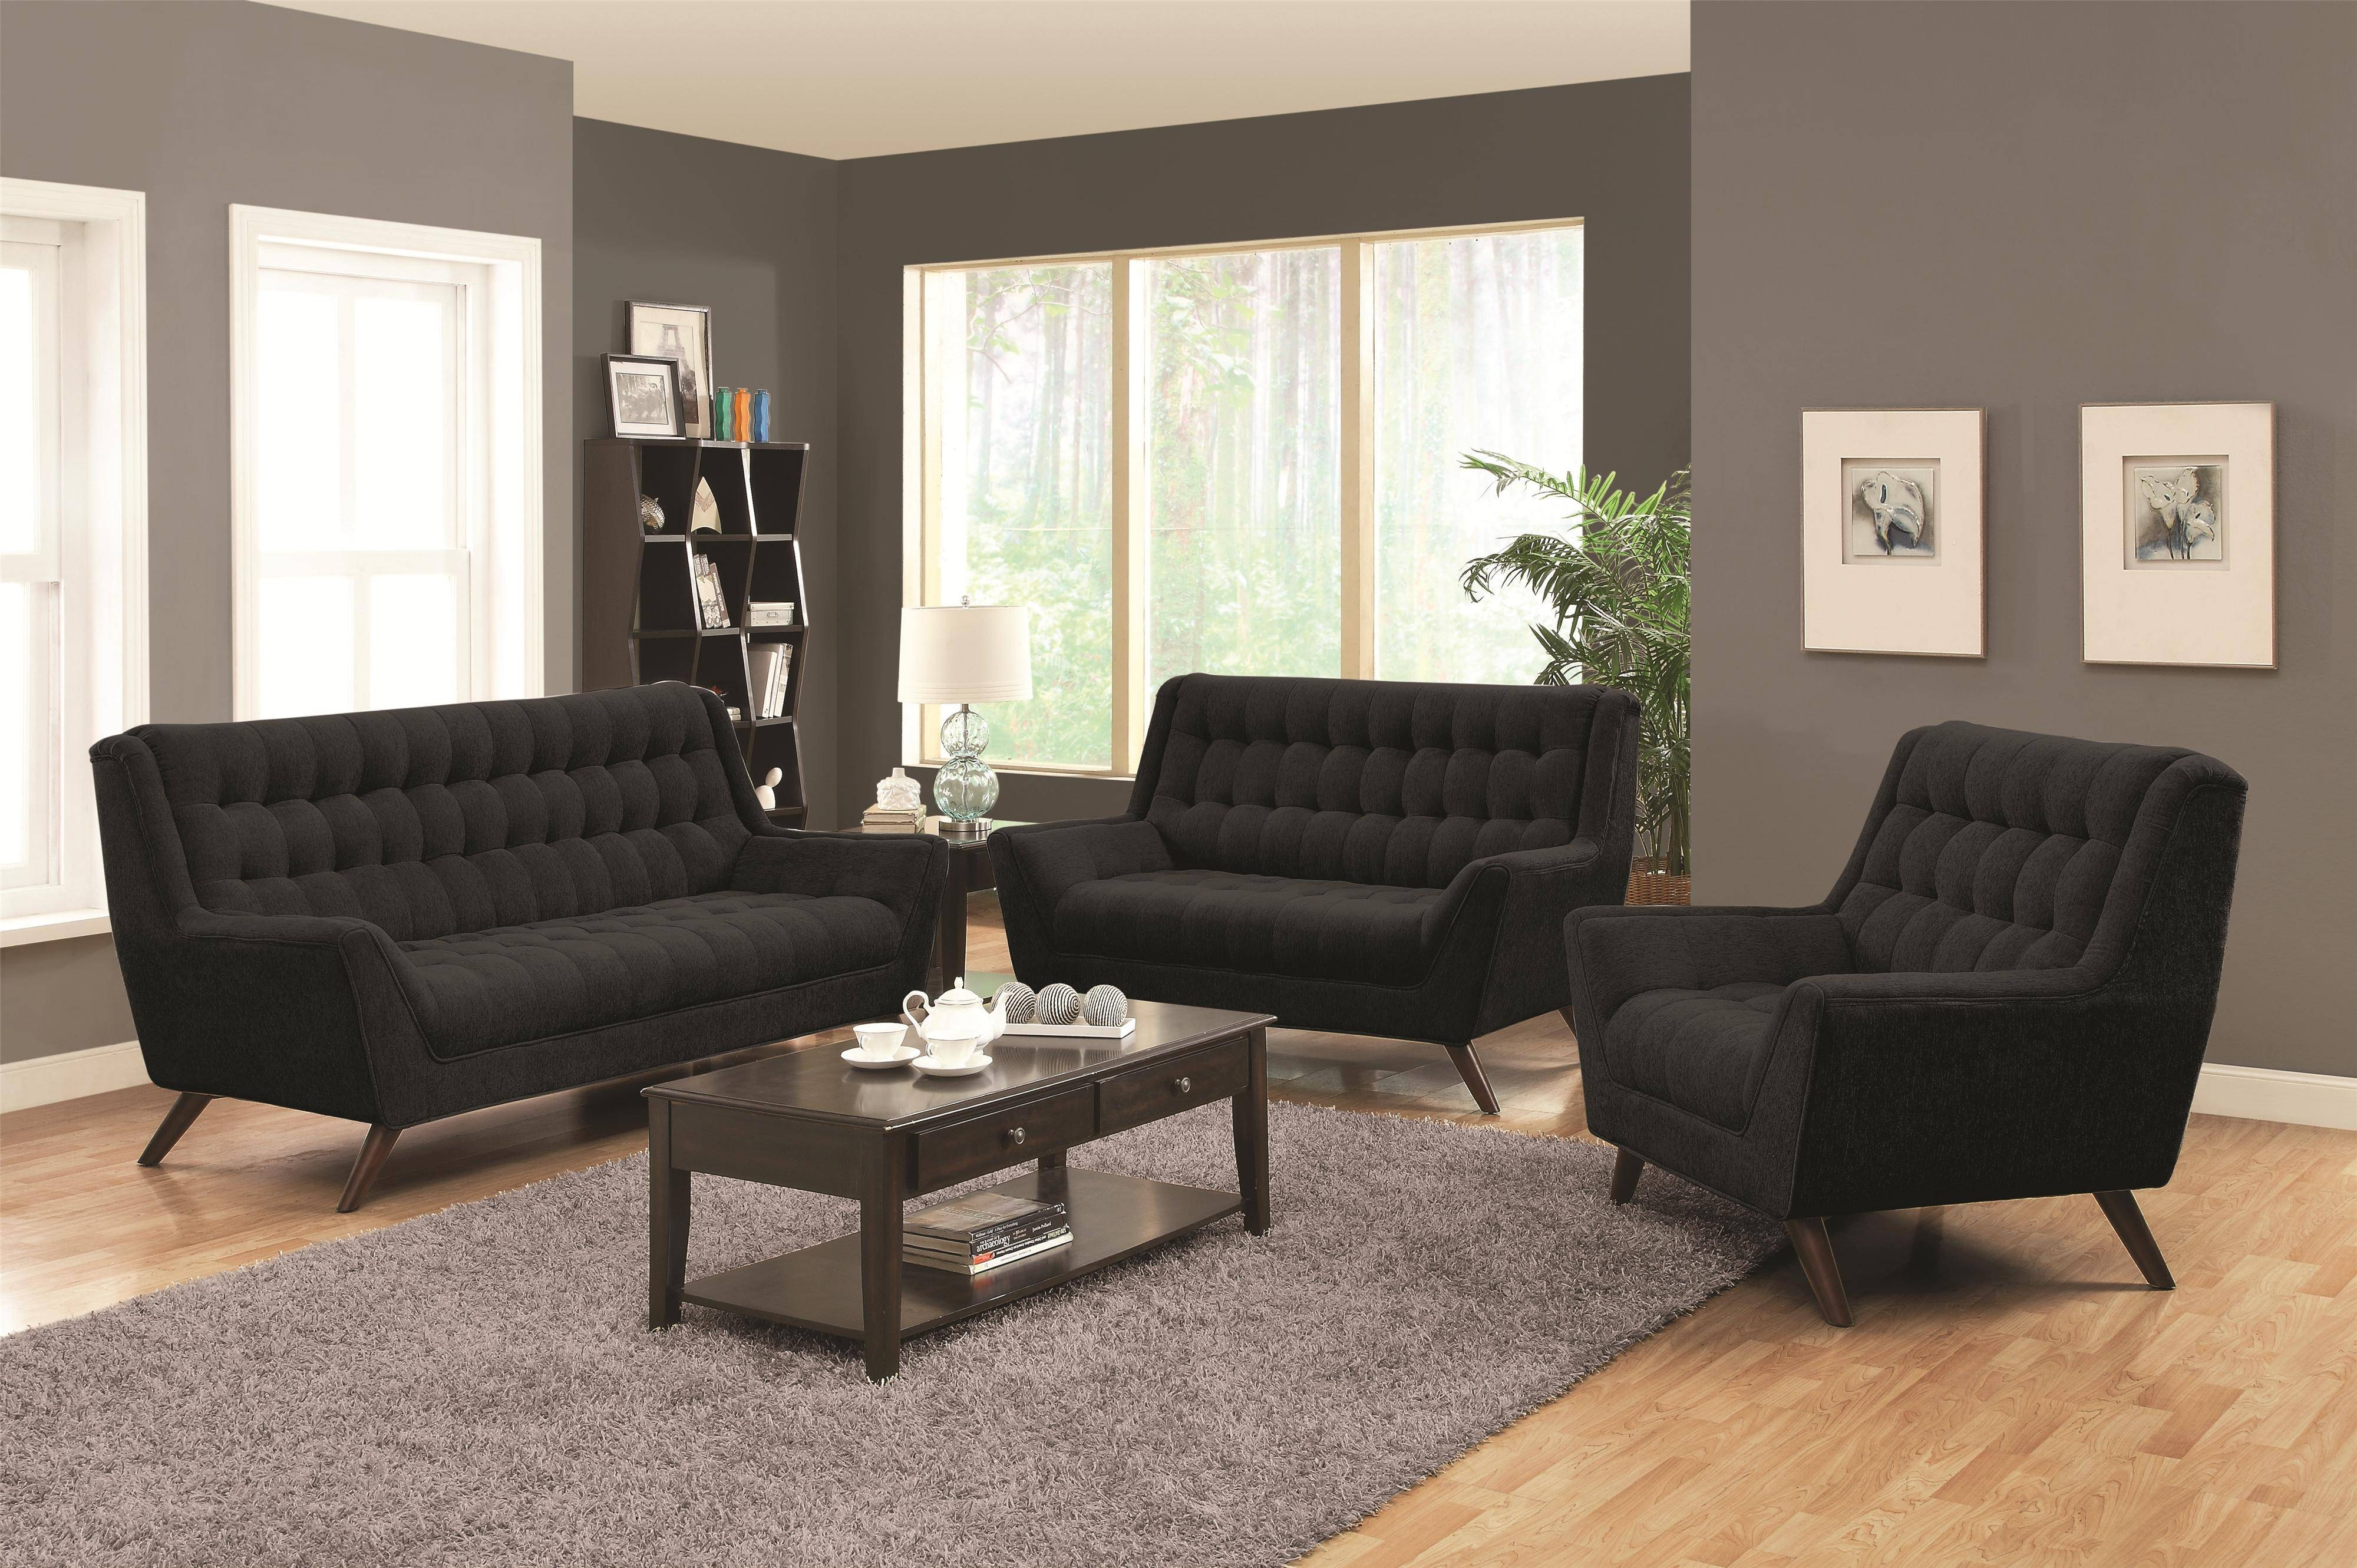 Coaster Natalia Retro Sofa W/ Flared Arms - Coaster Fine Furniture pertaining to Retro Sofas And Chairs (Image 3 of 15)